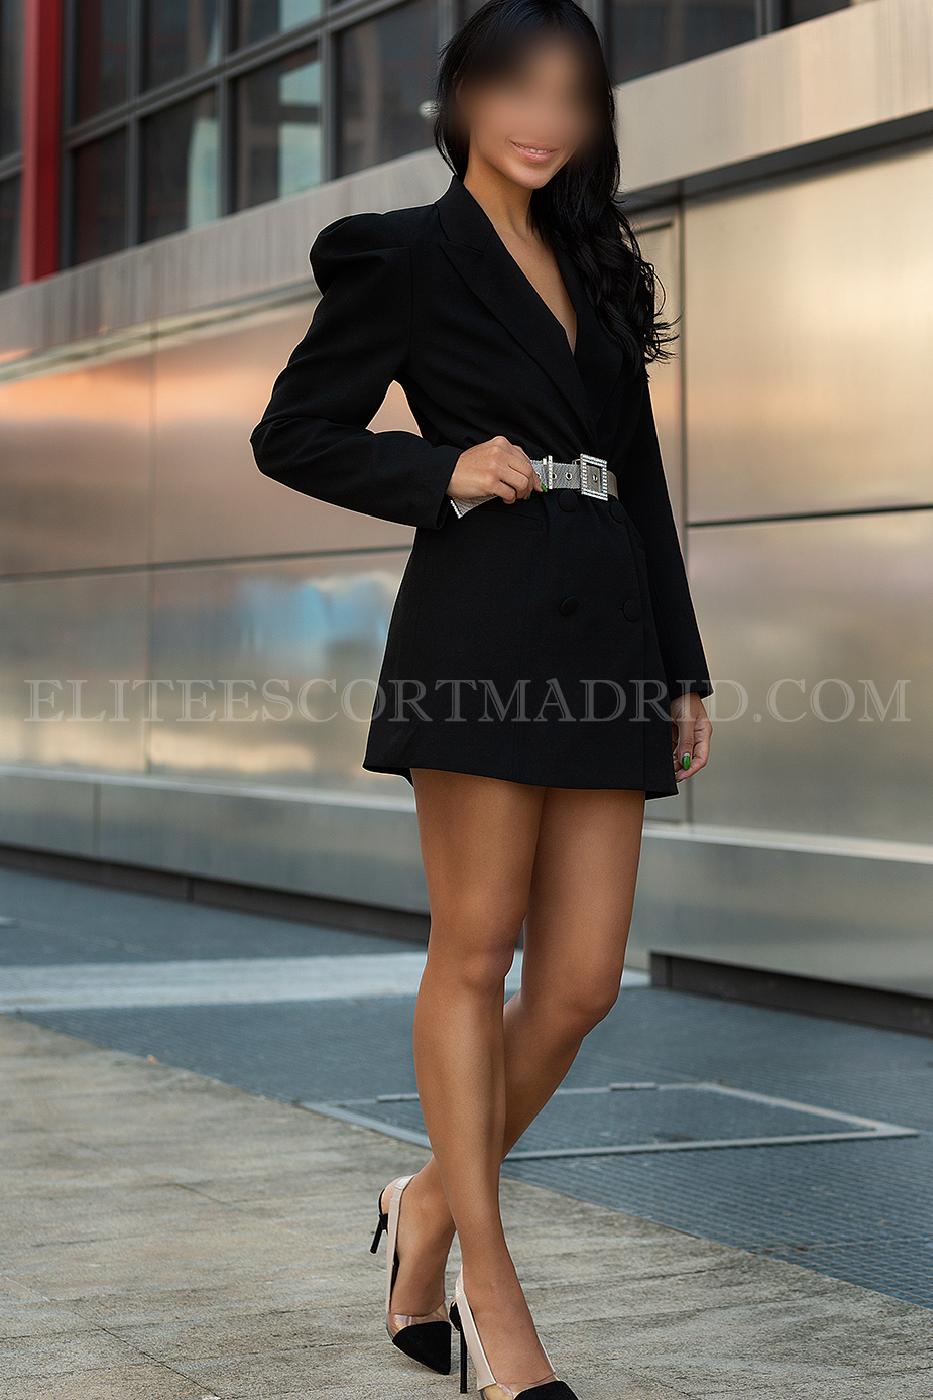 Coral, escort VIP en Madrid